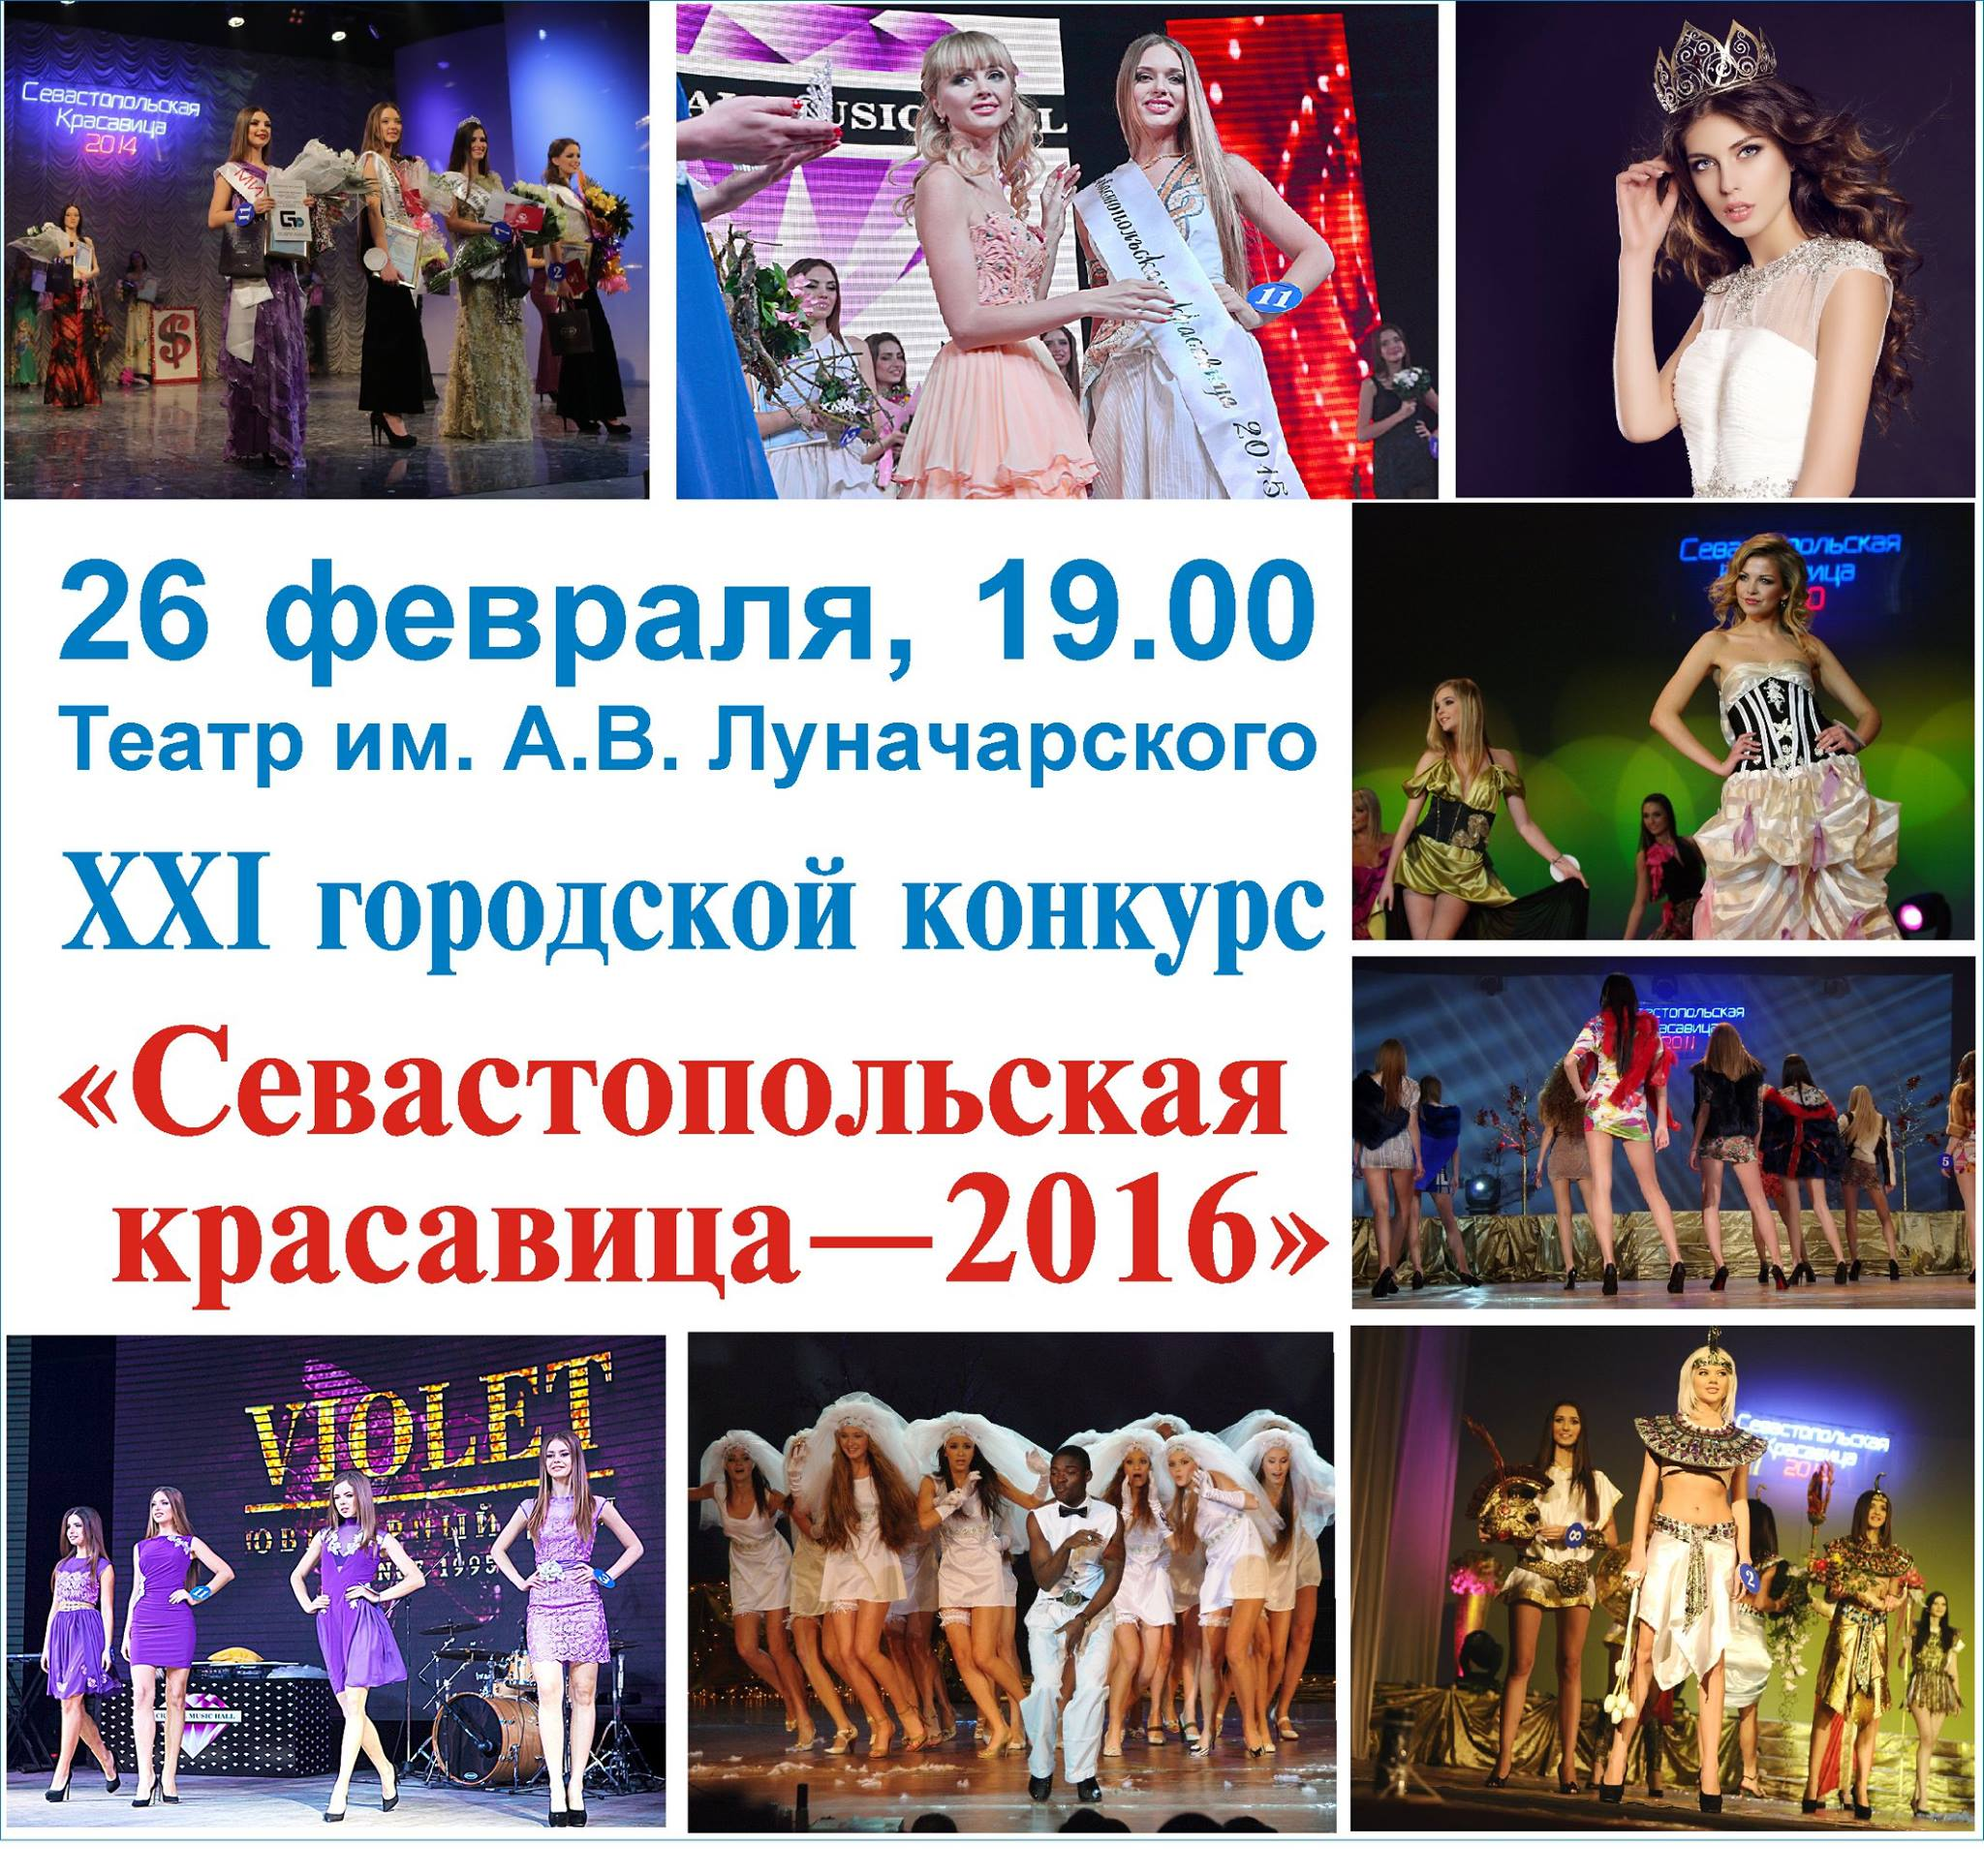 В Севастополе выберут красавицу-2016